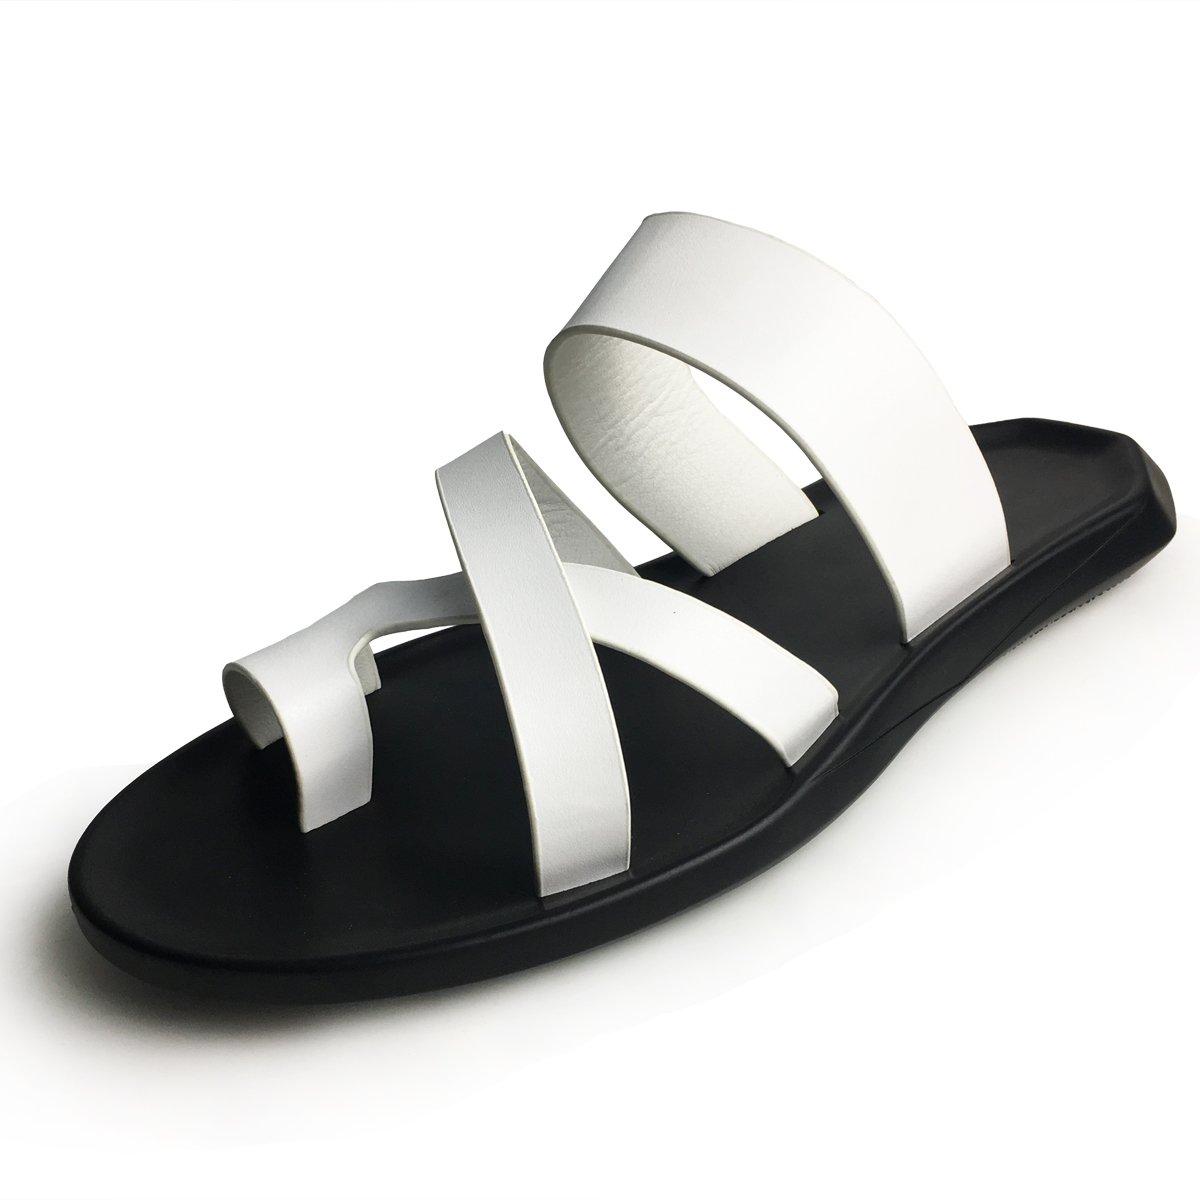 365b63984f10 URBANFIND Men s Beach Wedding Flip Flops Vintage PU Leather Thong Slides  Sandals Casual Summer Mules Clogs